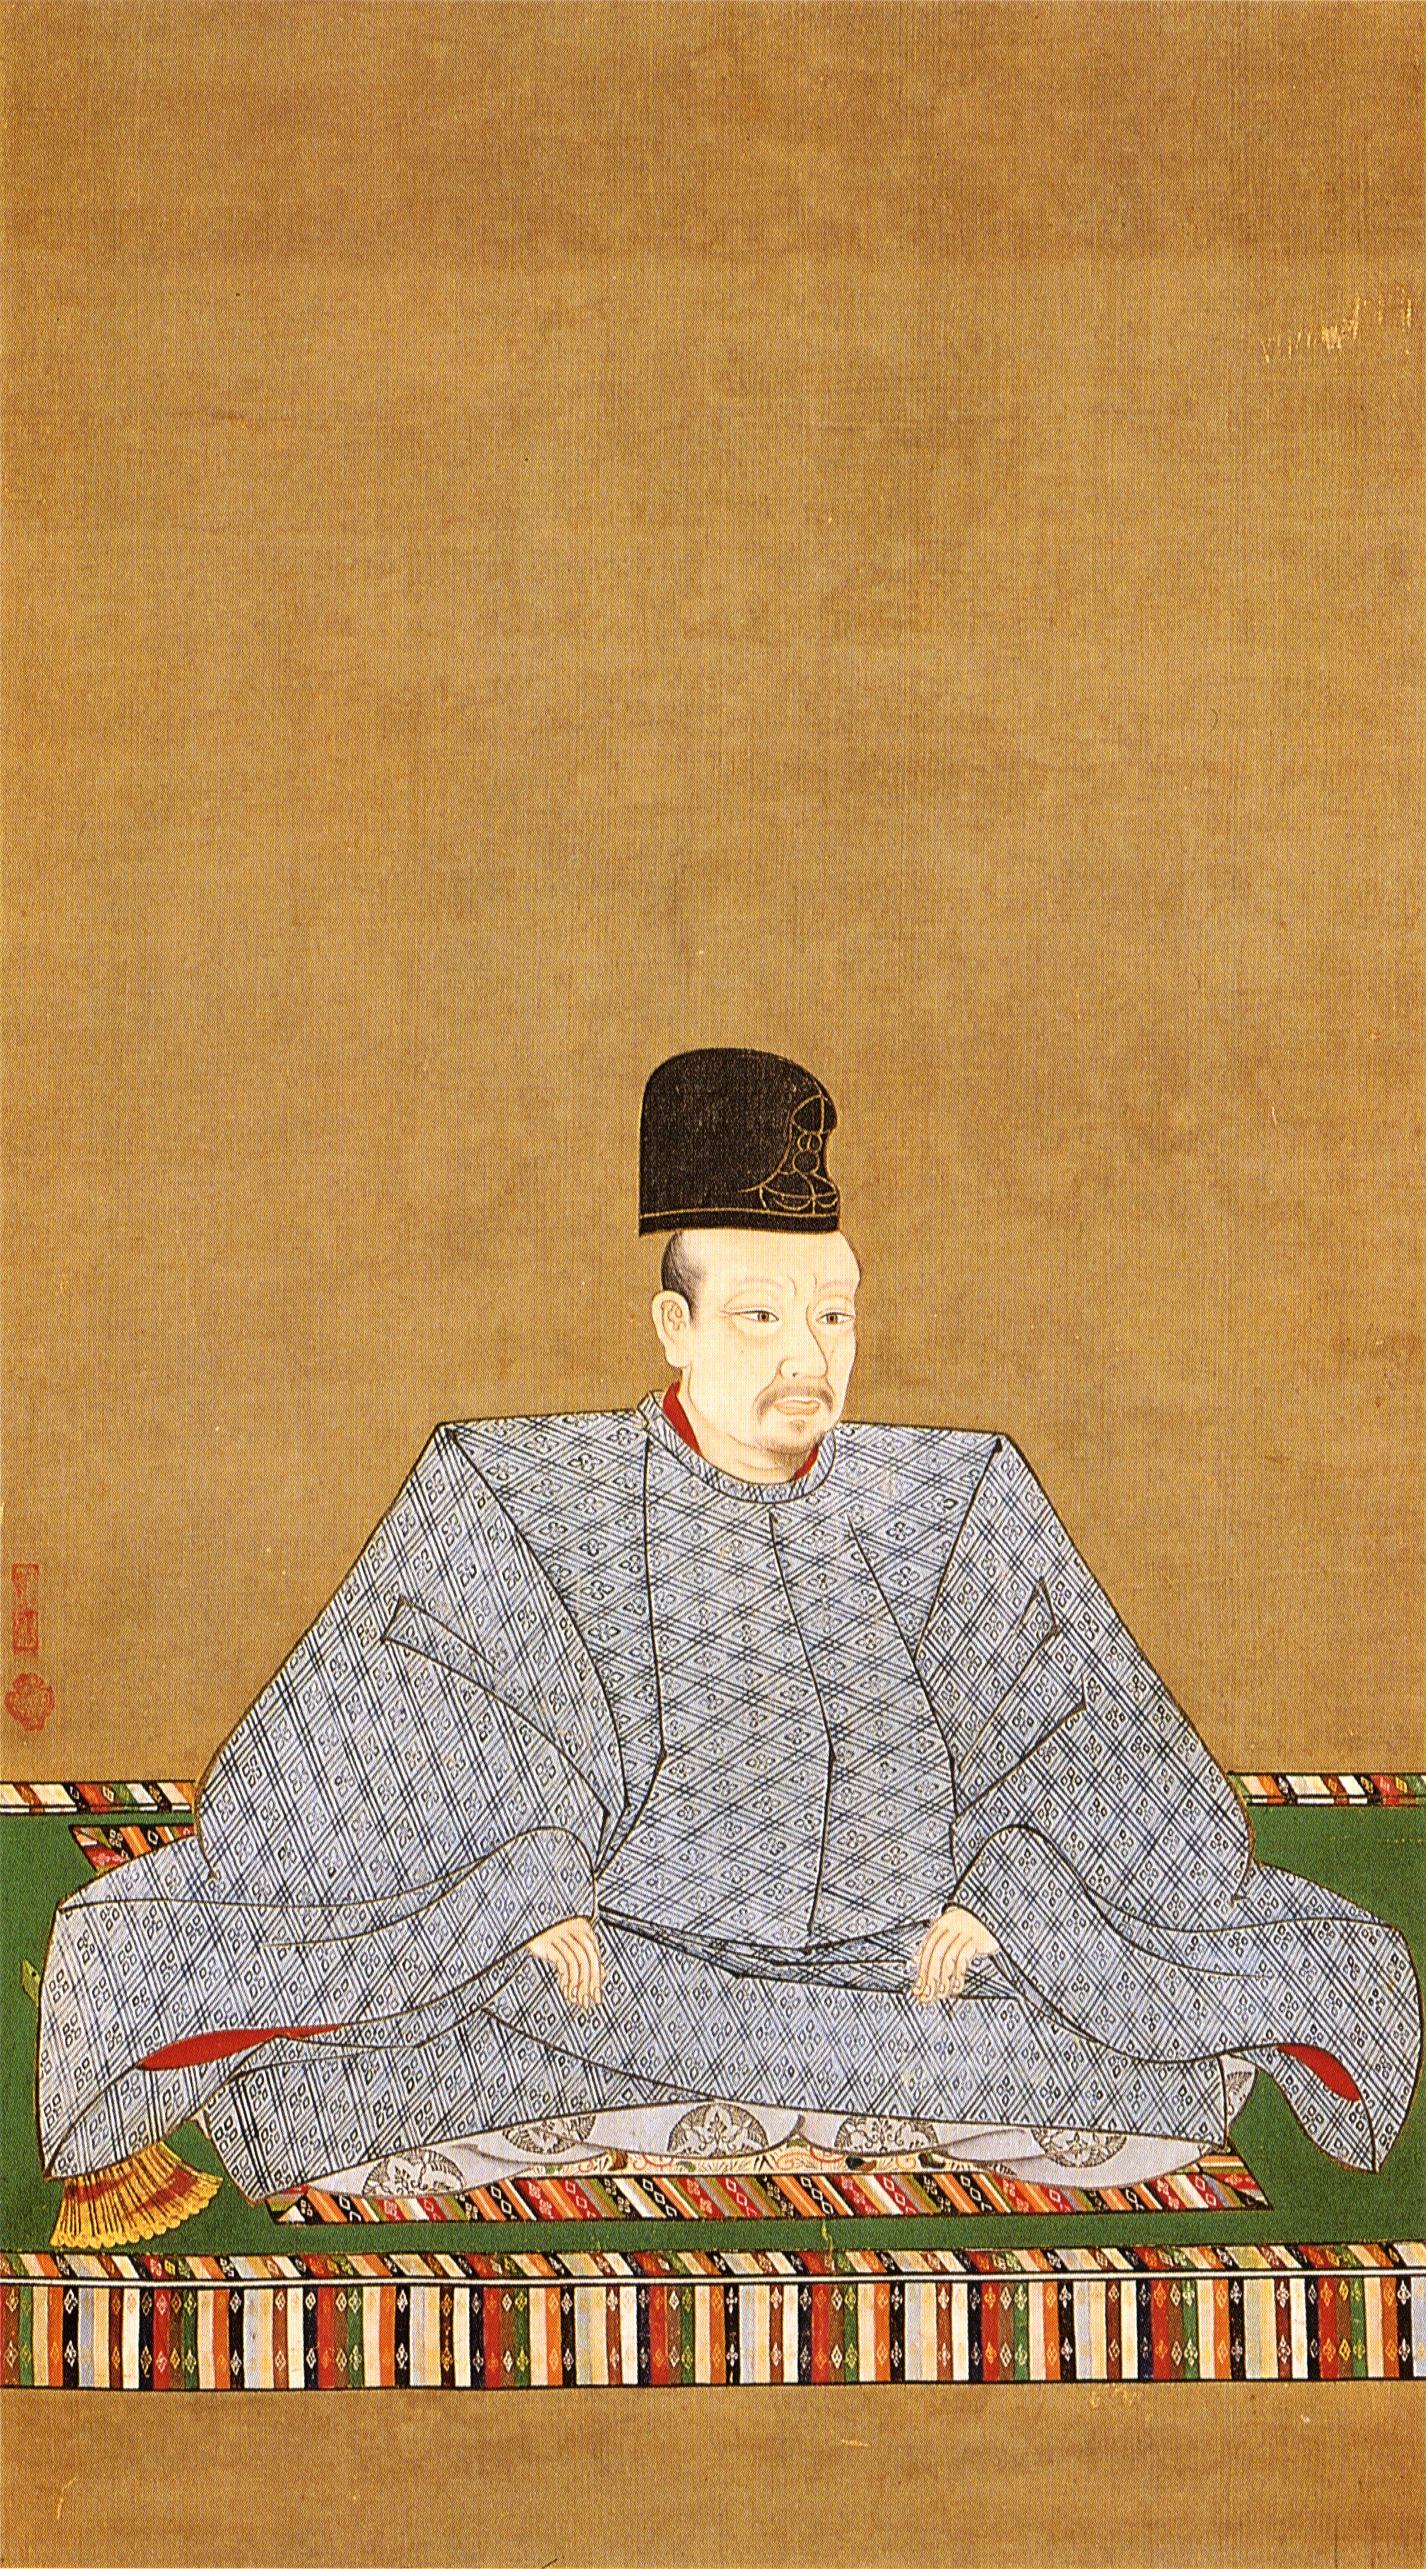 shogun and emperor relationship